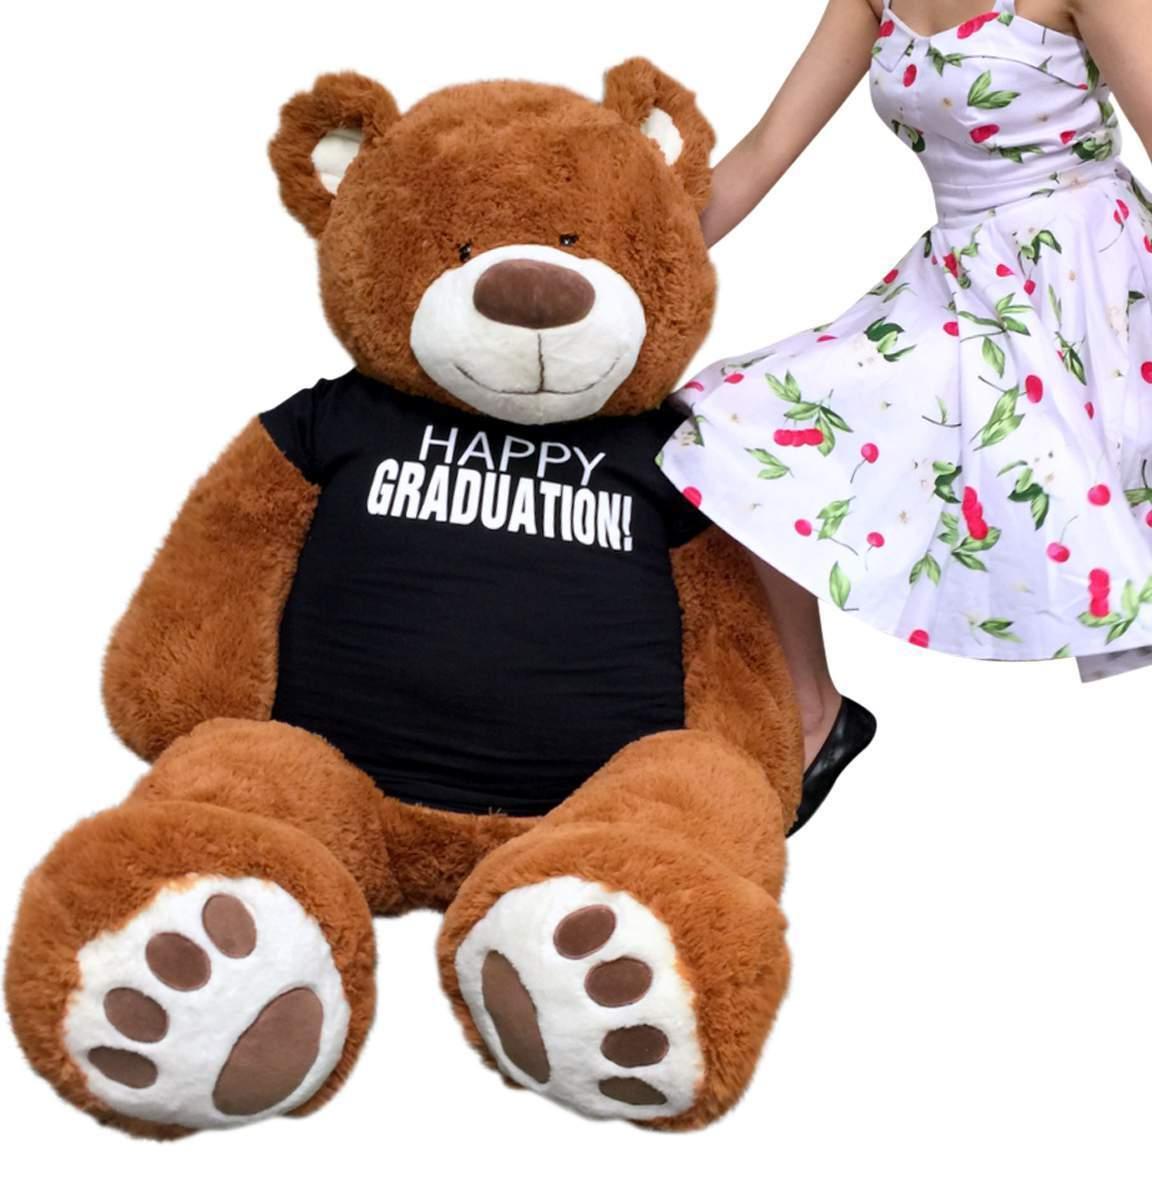 Big Plush 5 Foot Graduation Teddy Bear Soft, Cinnamon color, Happy Graduation